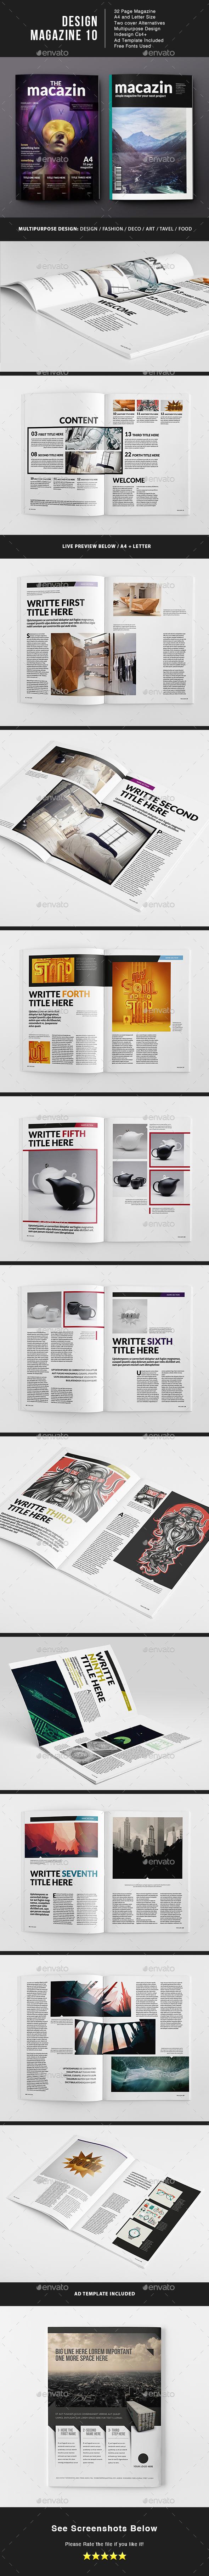 Design Magazine 10 Template - Magazines Print Templates